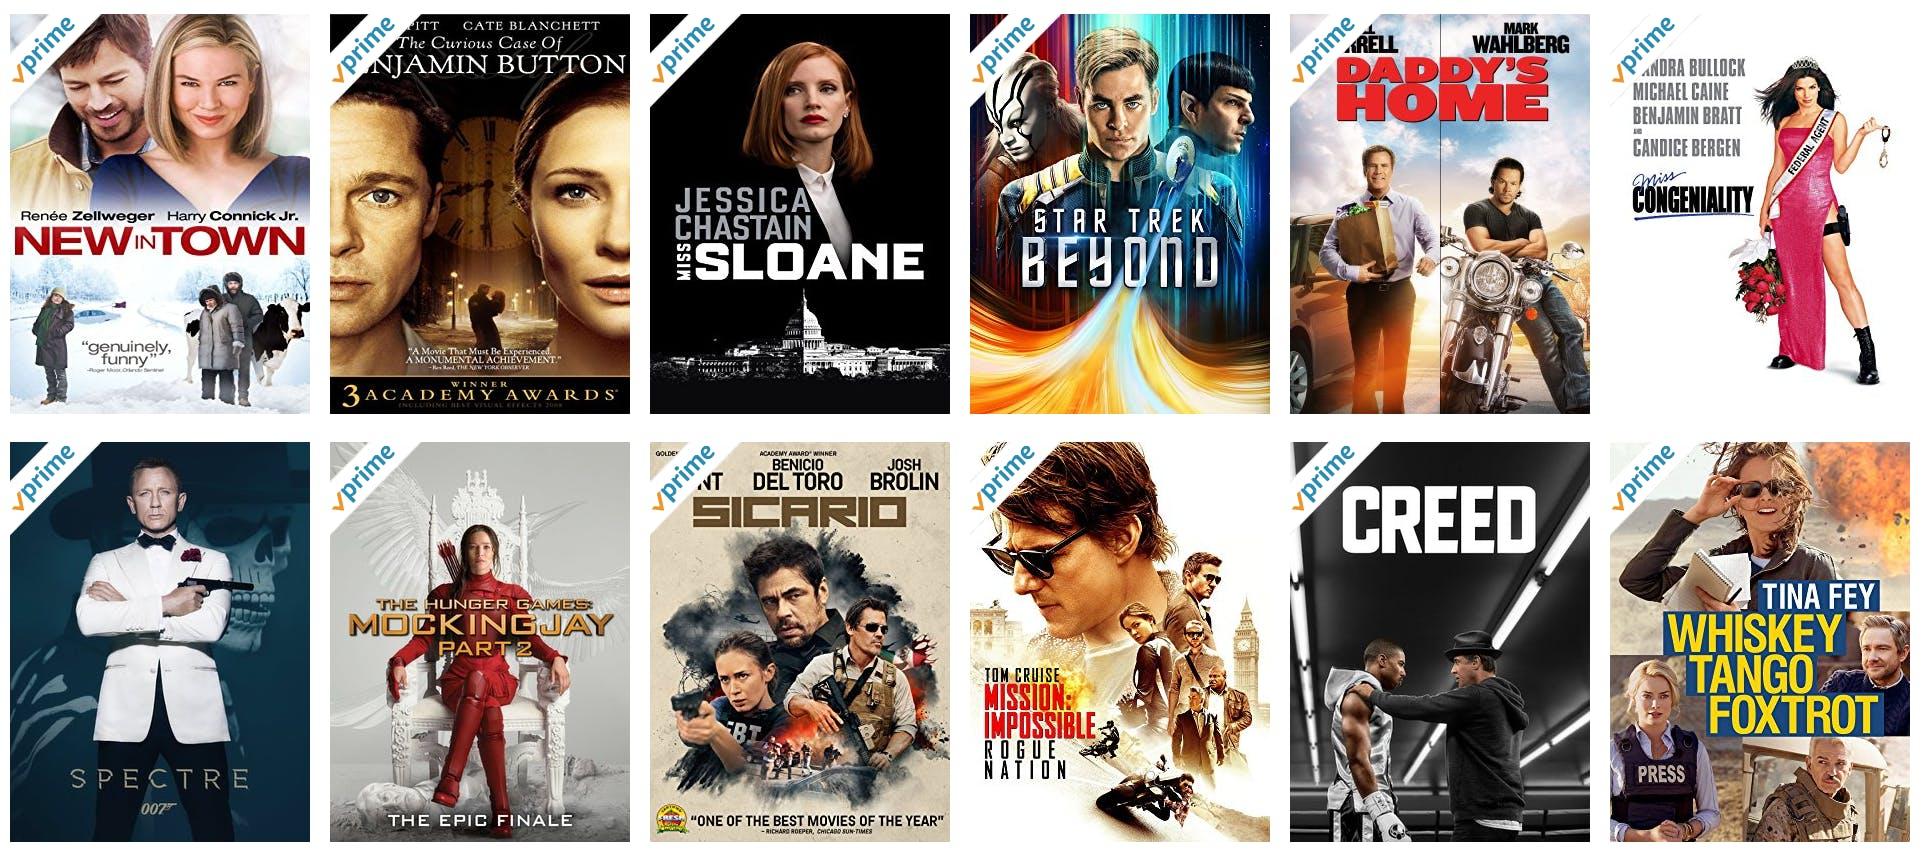 amazon prime vs netflix movie selection